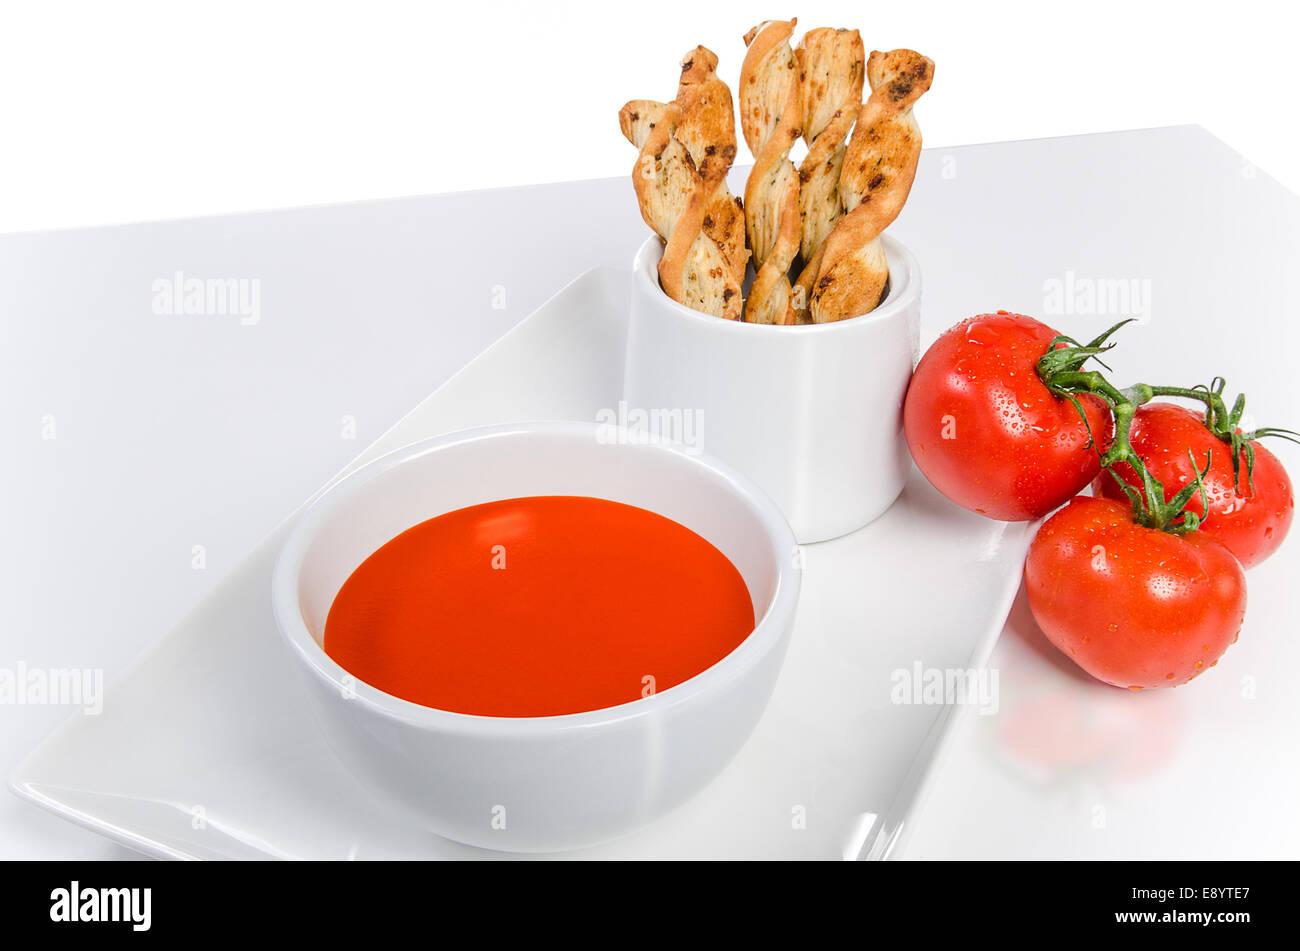 bread sticks tomato soup stockfotos bread sticks tomato. Black Bedroom Furniture Sets. Home Design Ideas